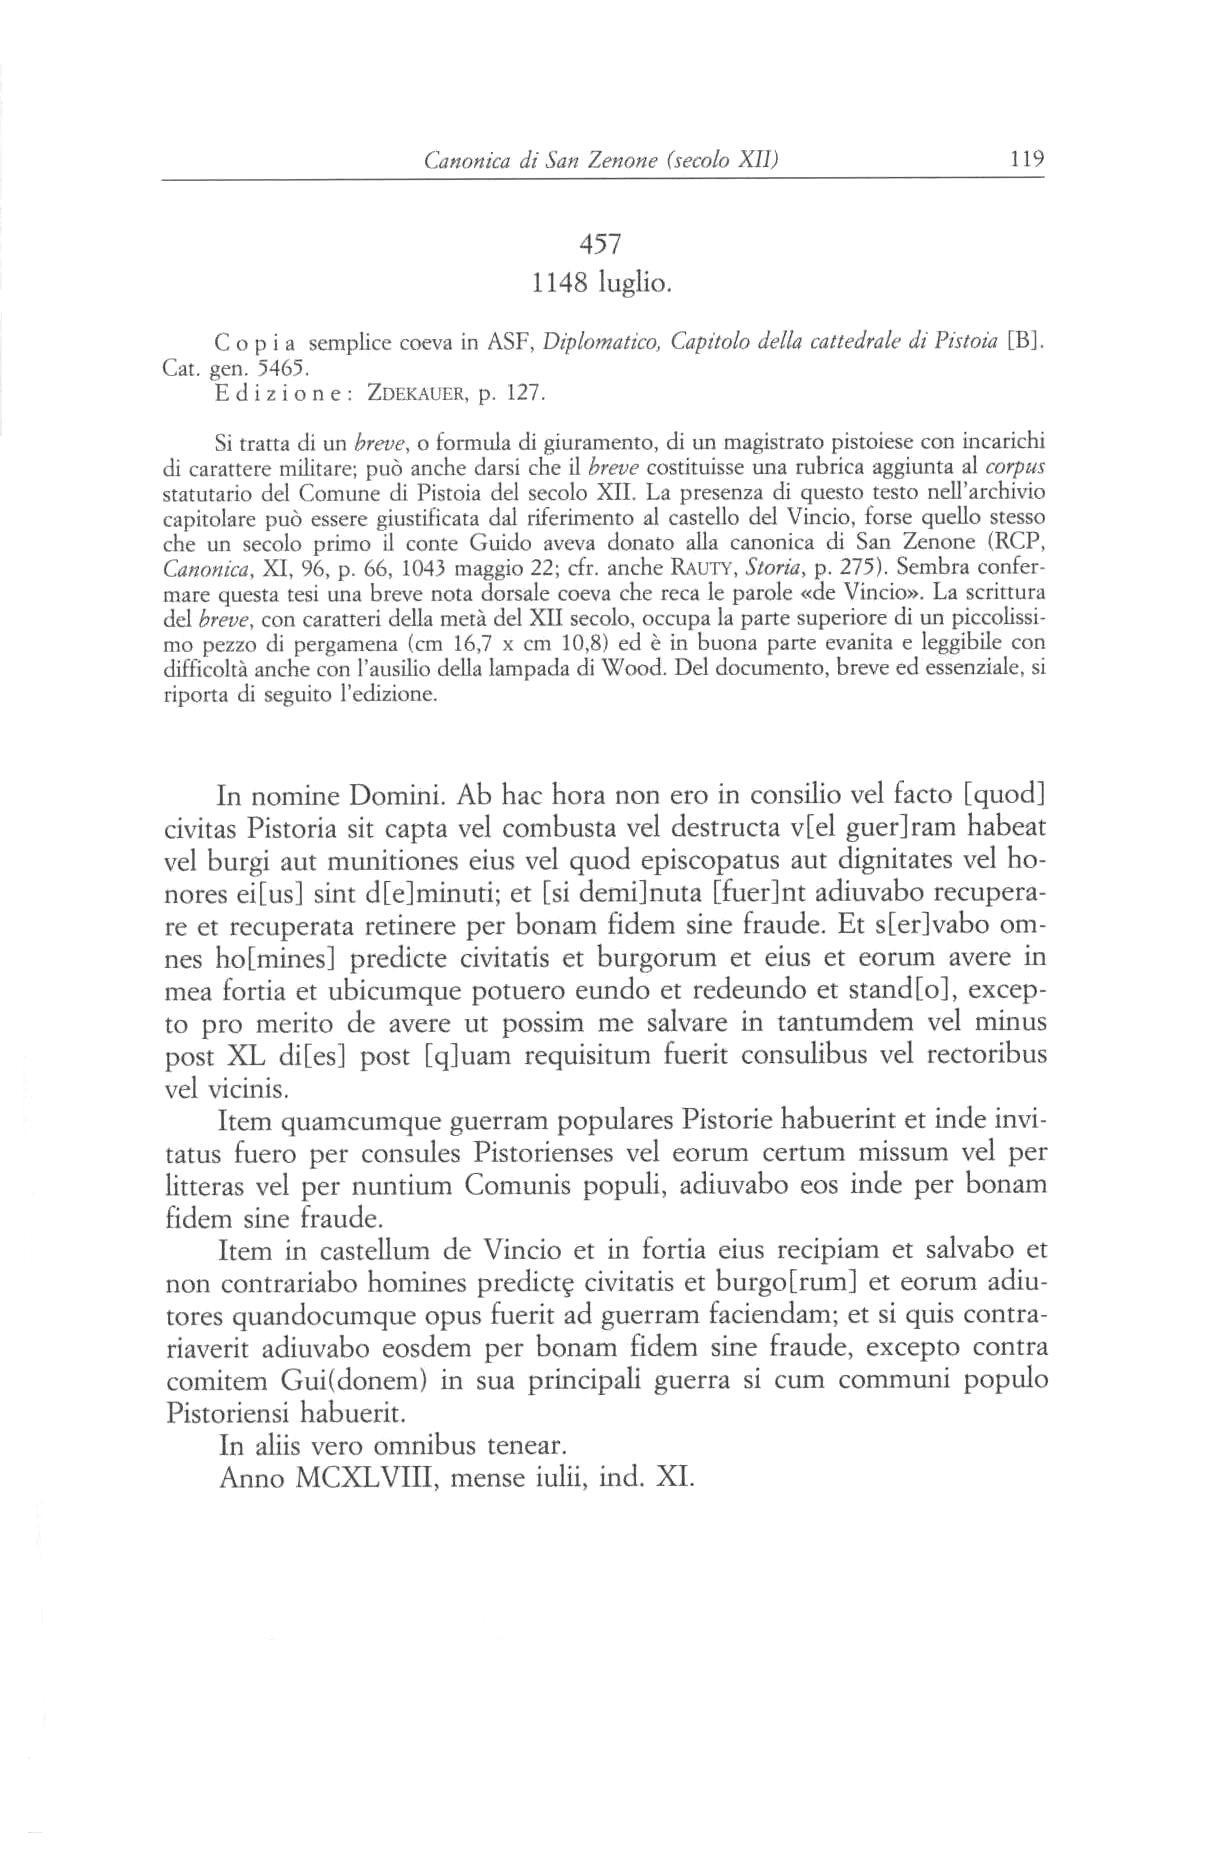 Canonica S. Zenone XII 0119.jpg